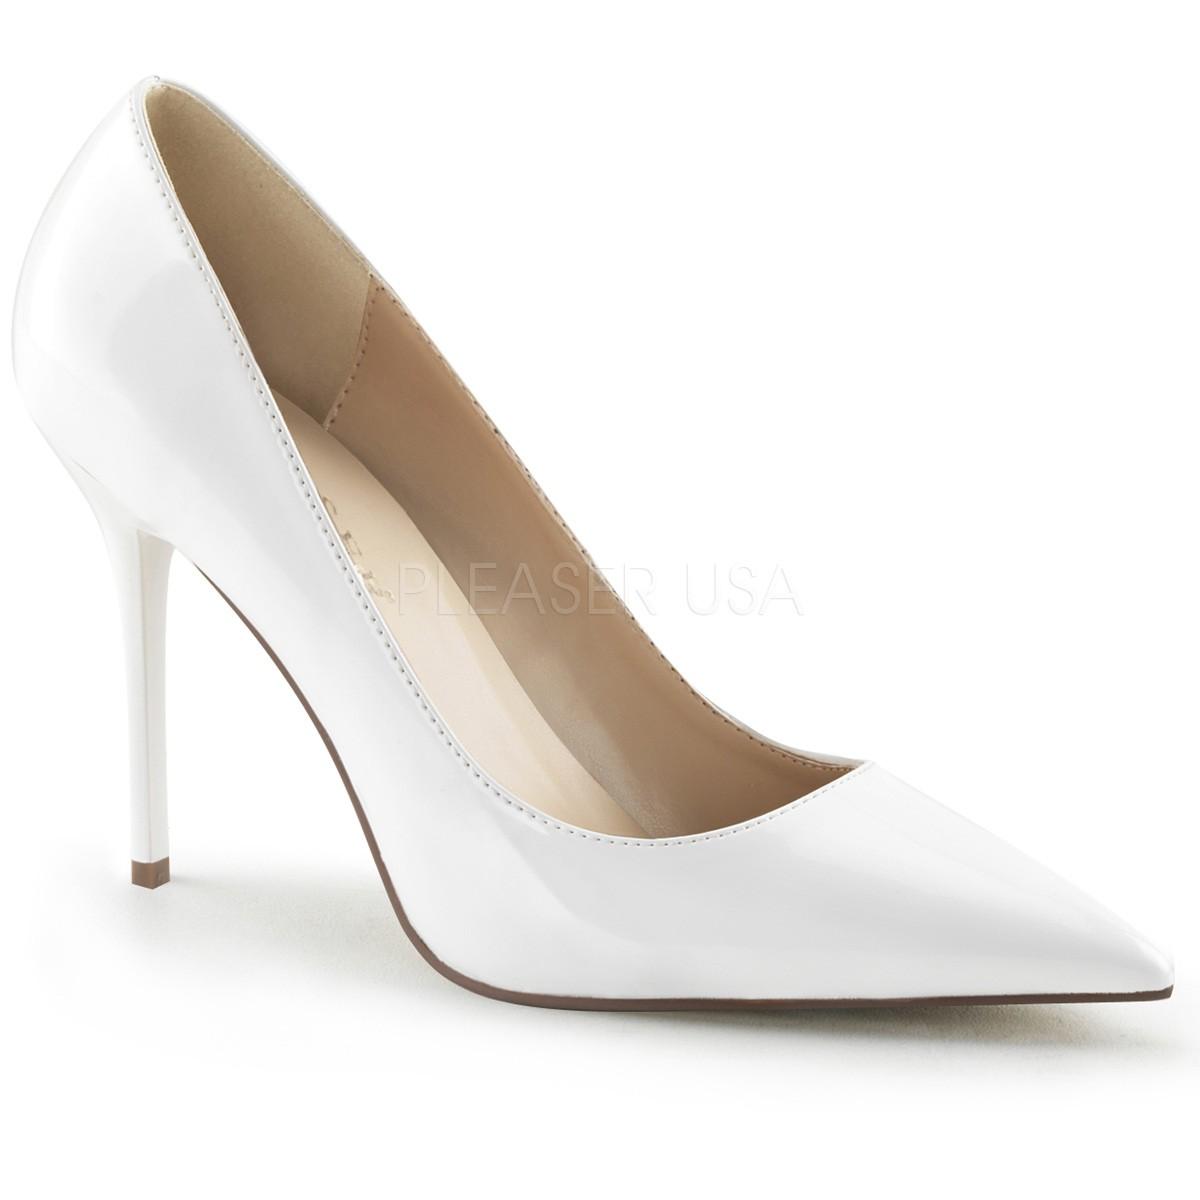 Escarpins Chaussure A Blanche Bride chaussures Blanc Talon Coloris uliTZwOPkX